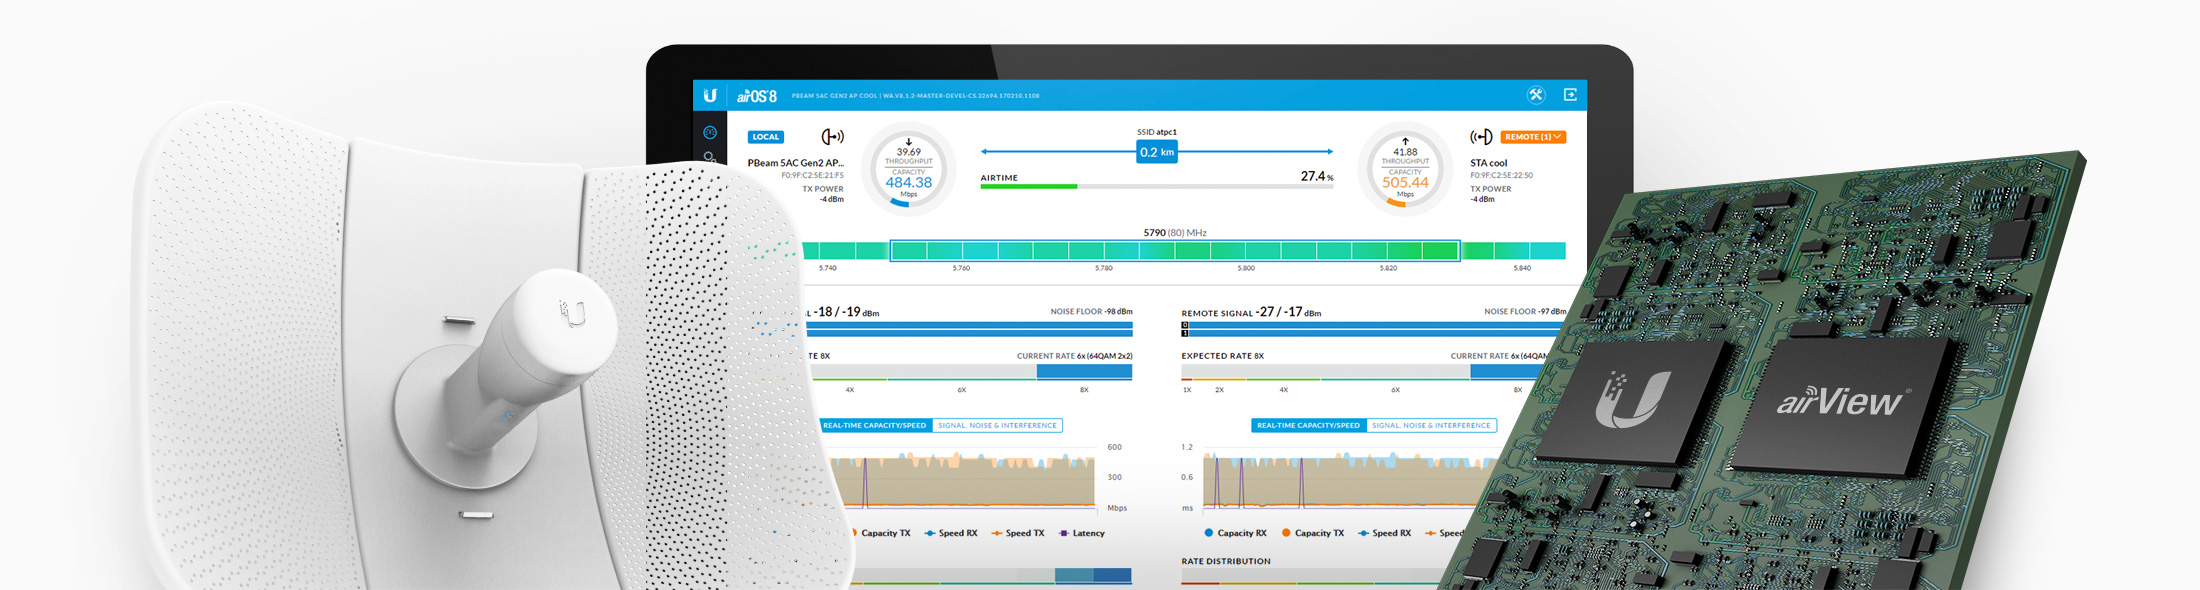 Ubiquiti Networks - LiteBeam® AC